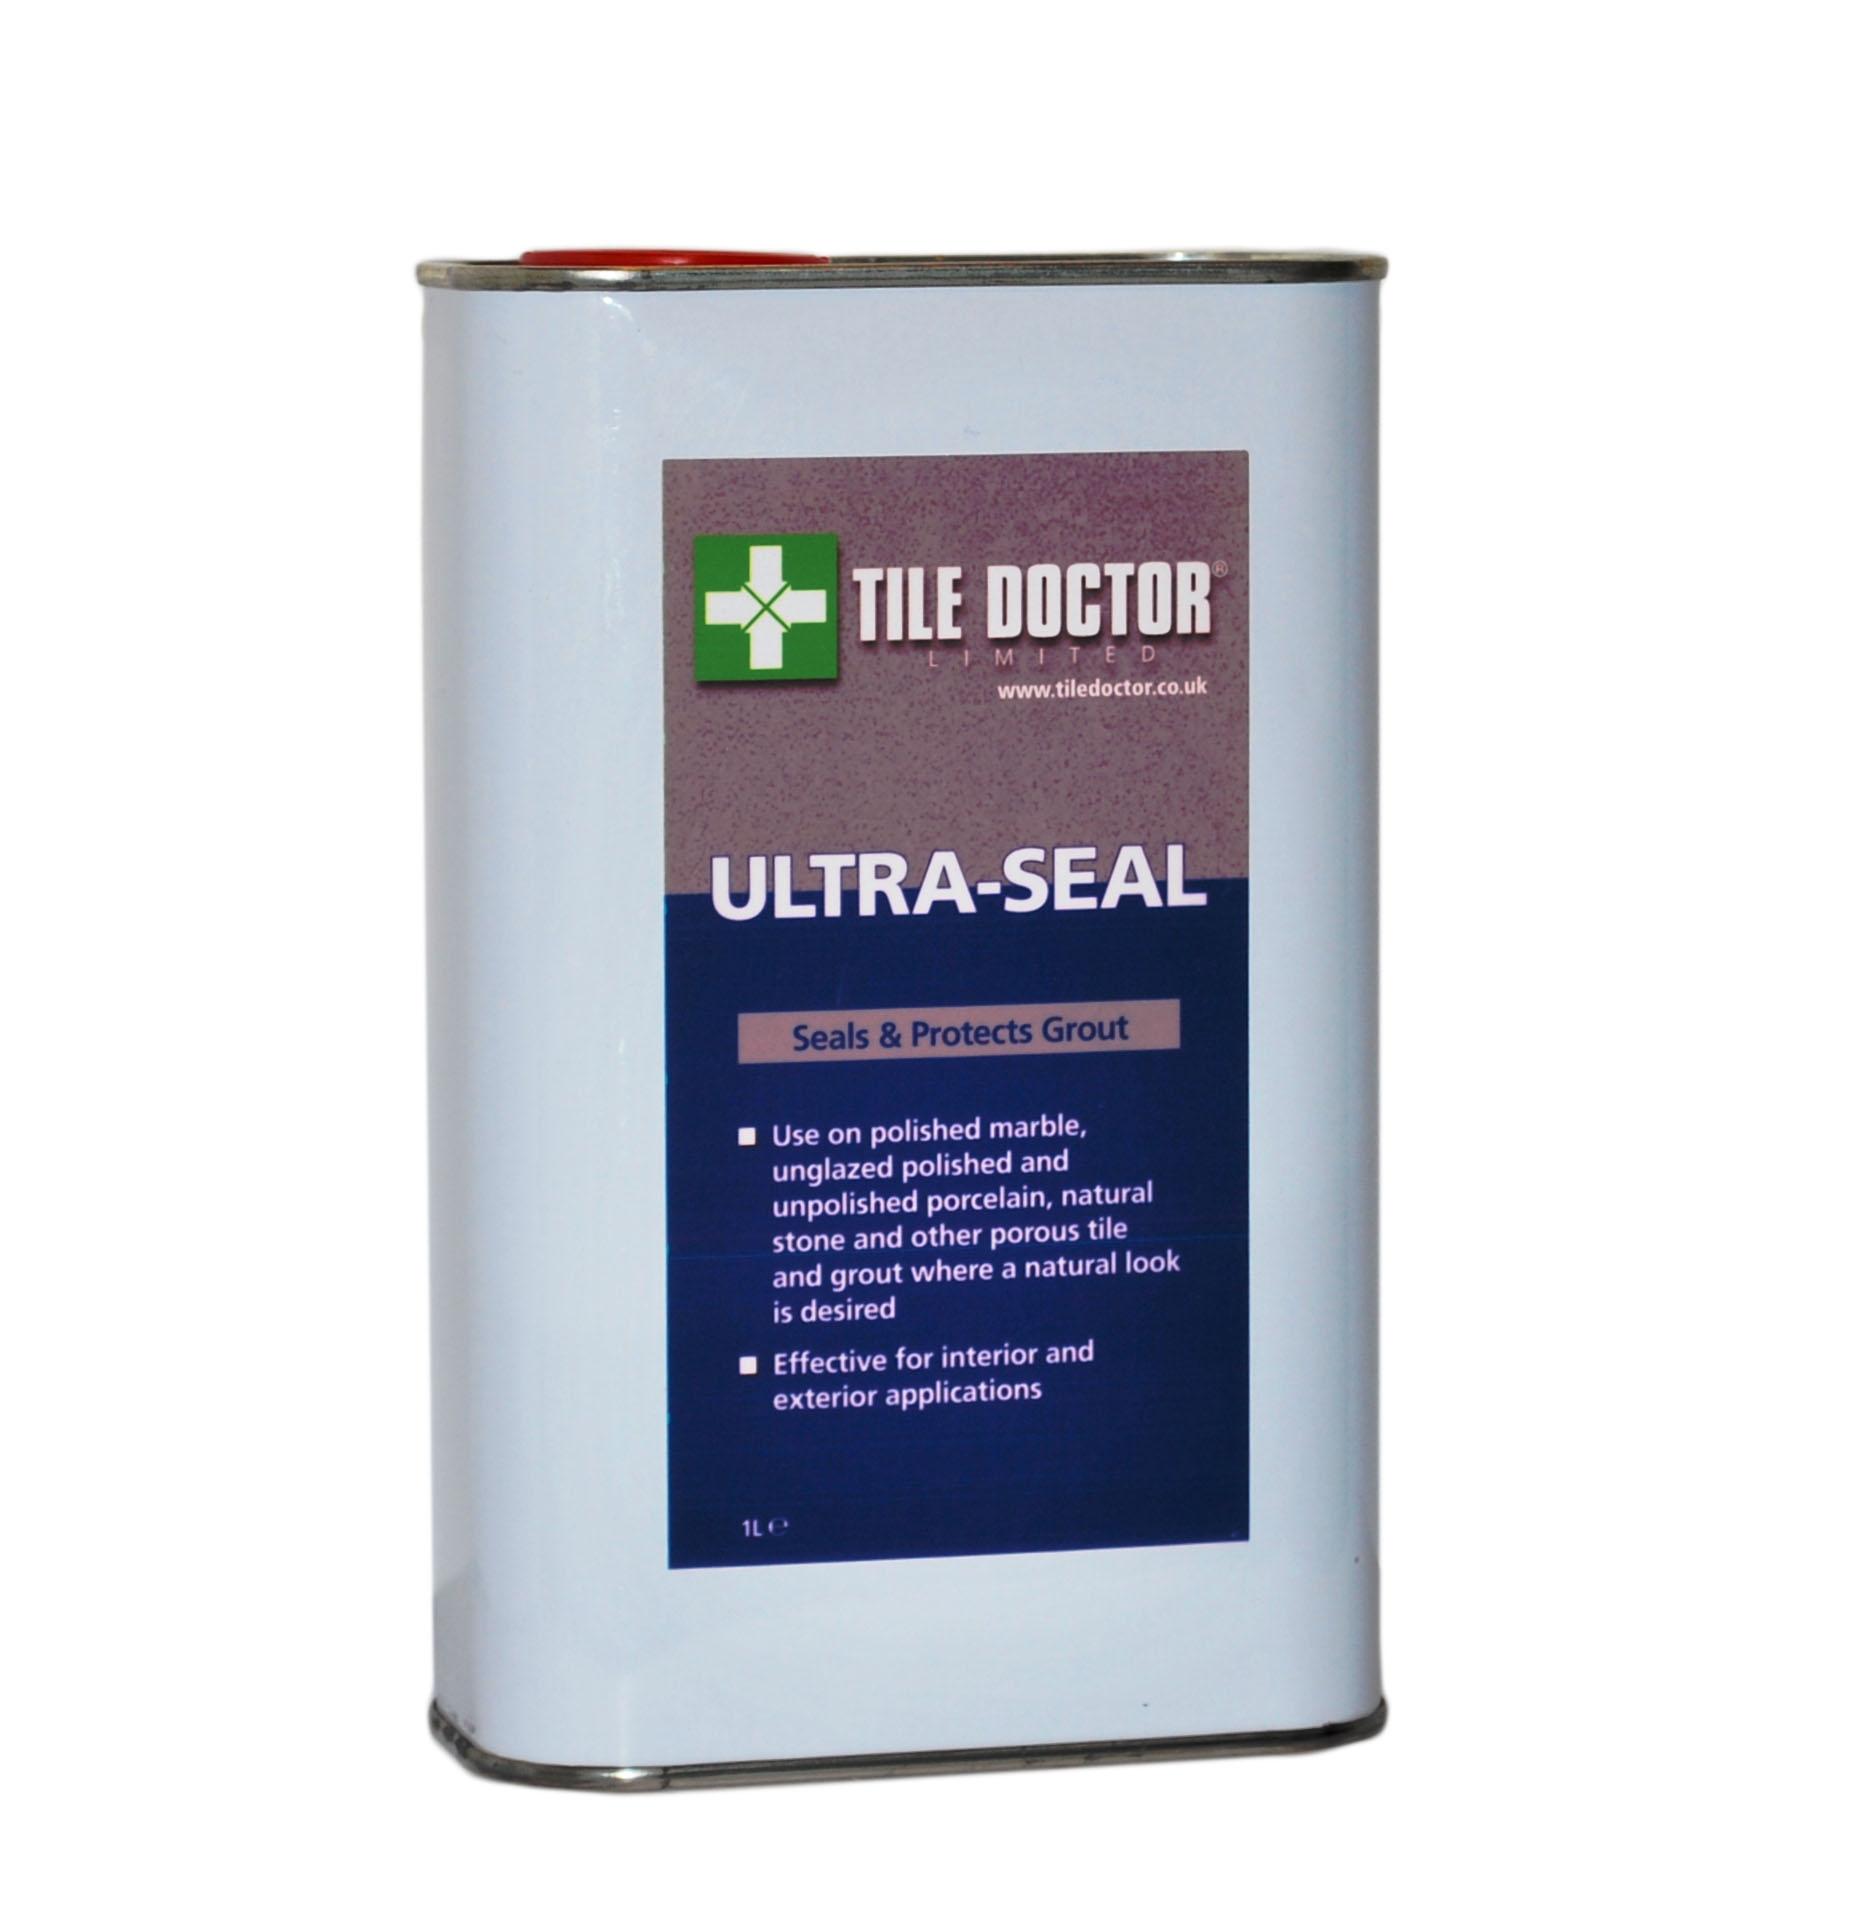 Tile Doctor Ultra-Seal 1 litre